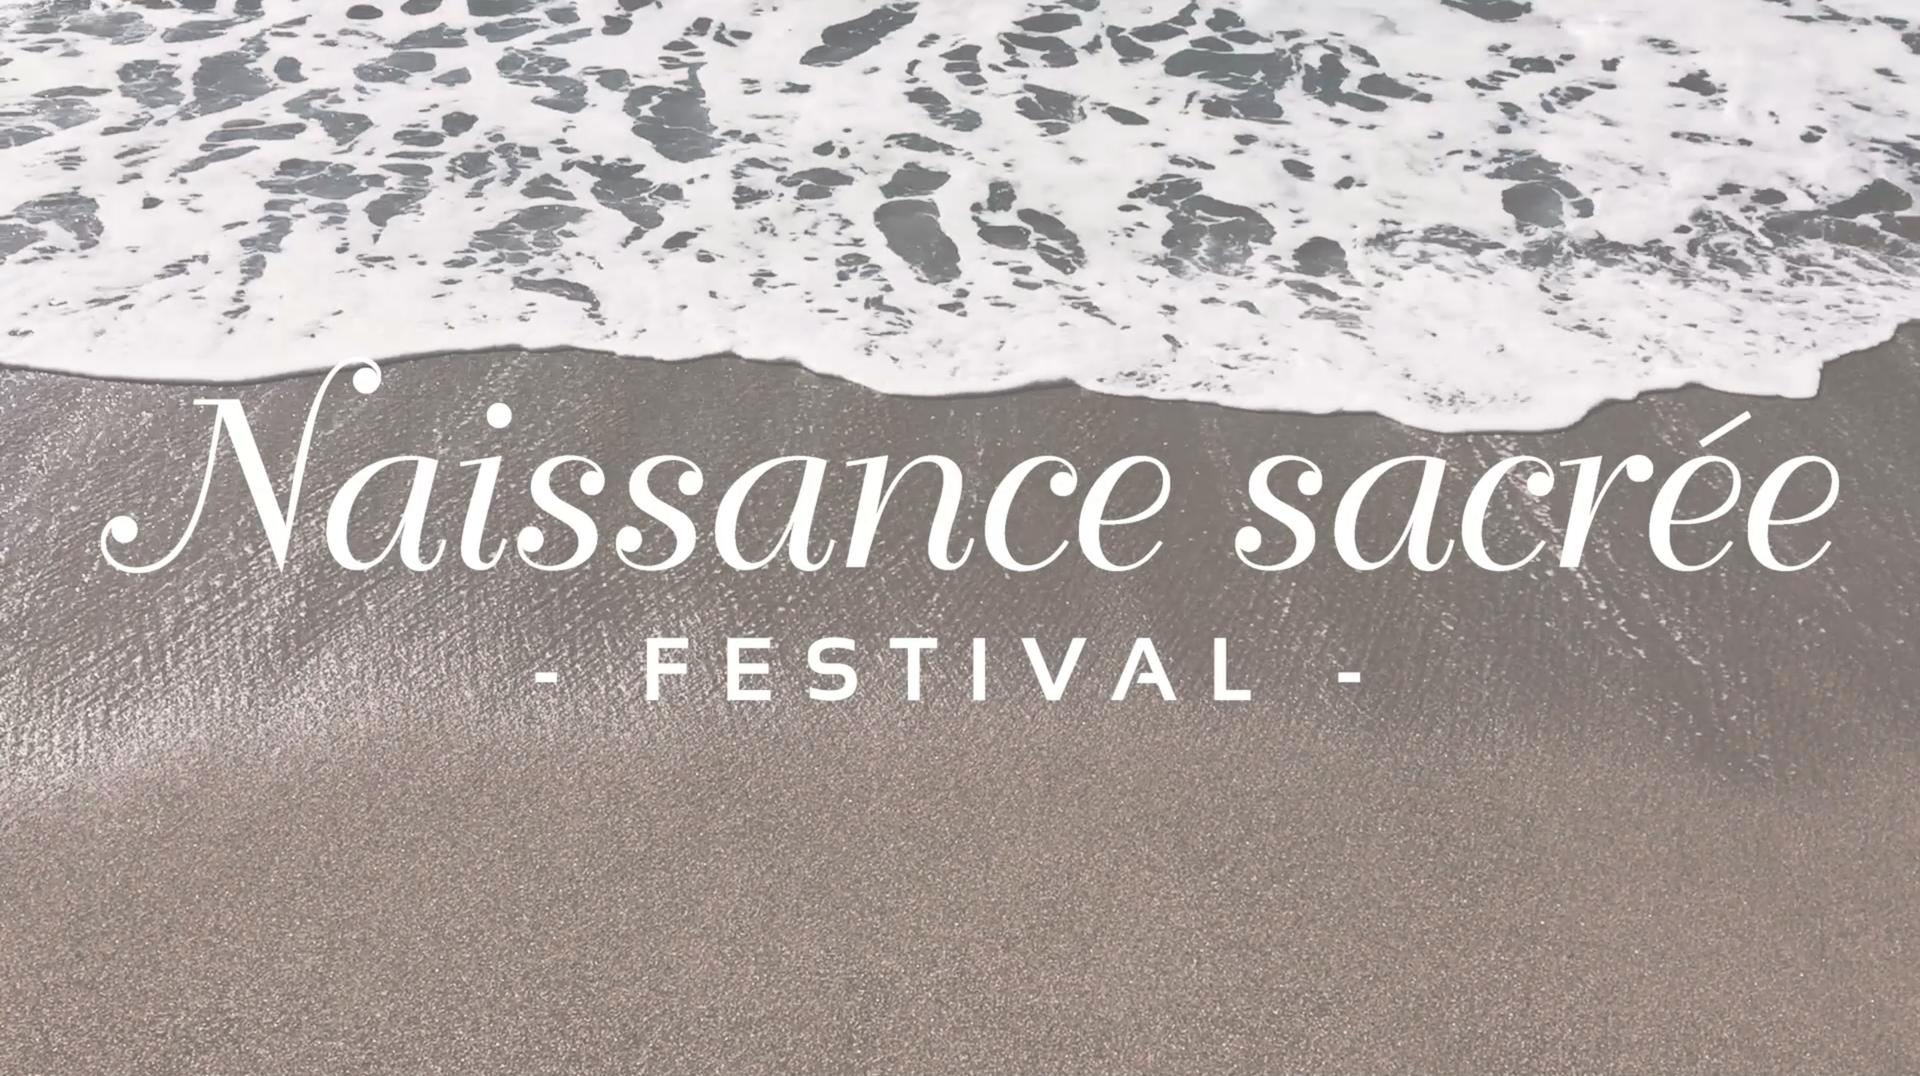 Naissance sacrée, Festival